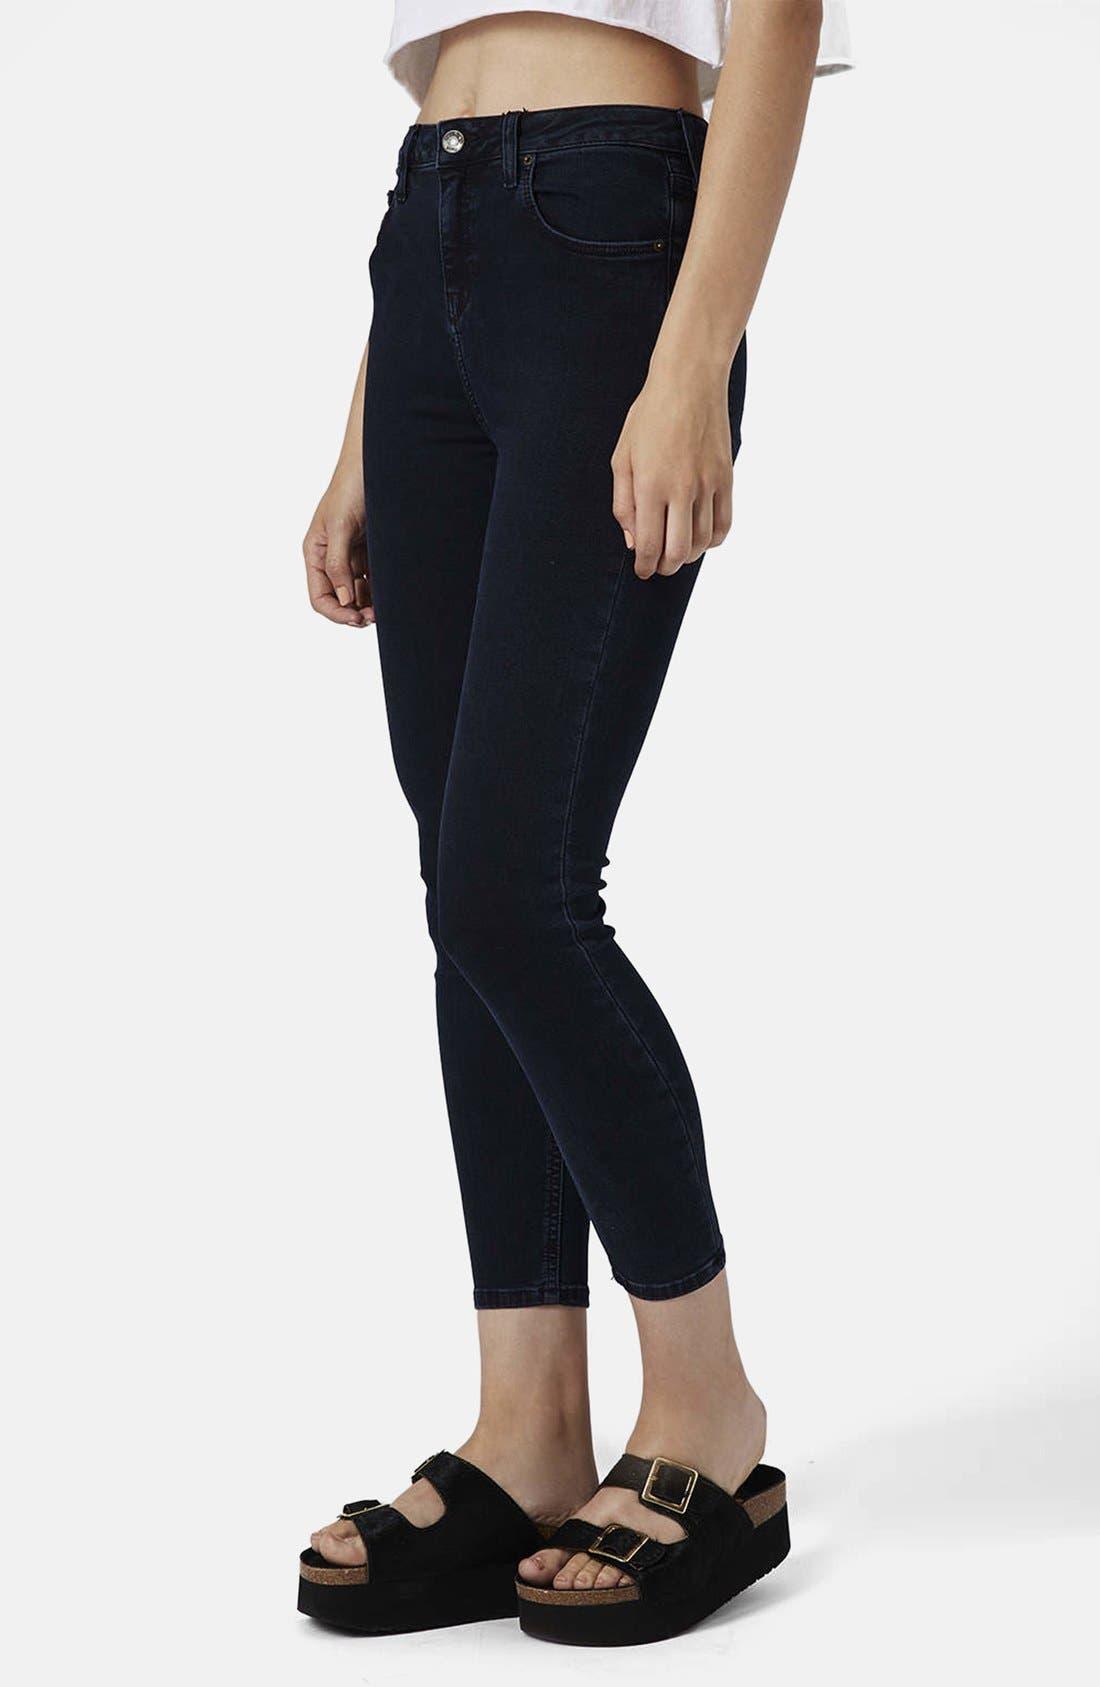 Main Image - Topshop Moto 'Jamie' High Rise Ankle Skinny Jeans (Blue Black) (Regular, Short & Long)